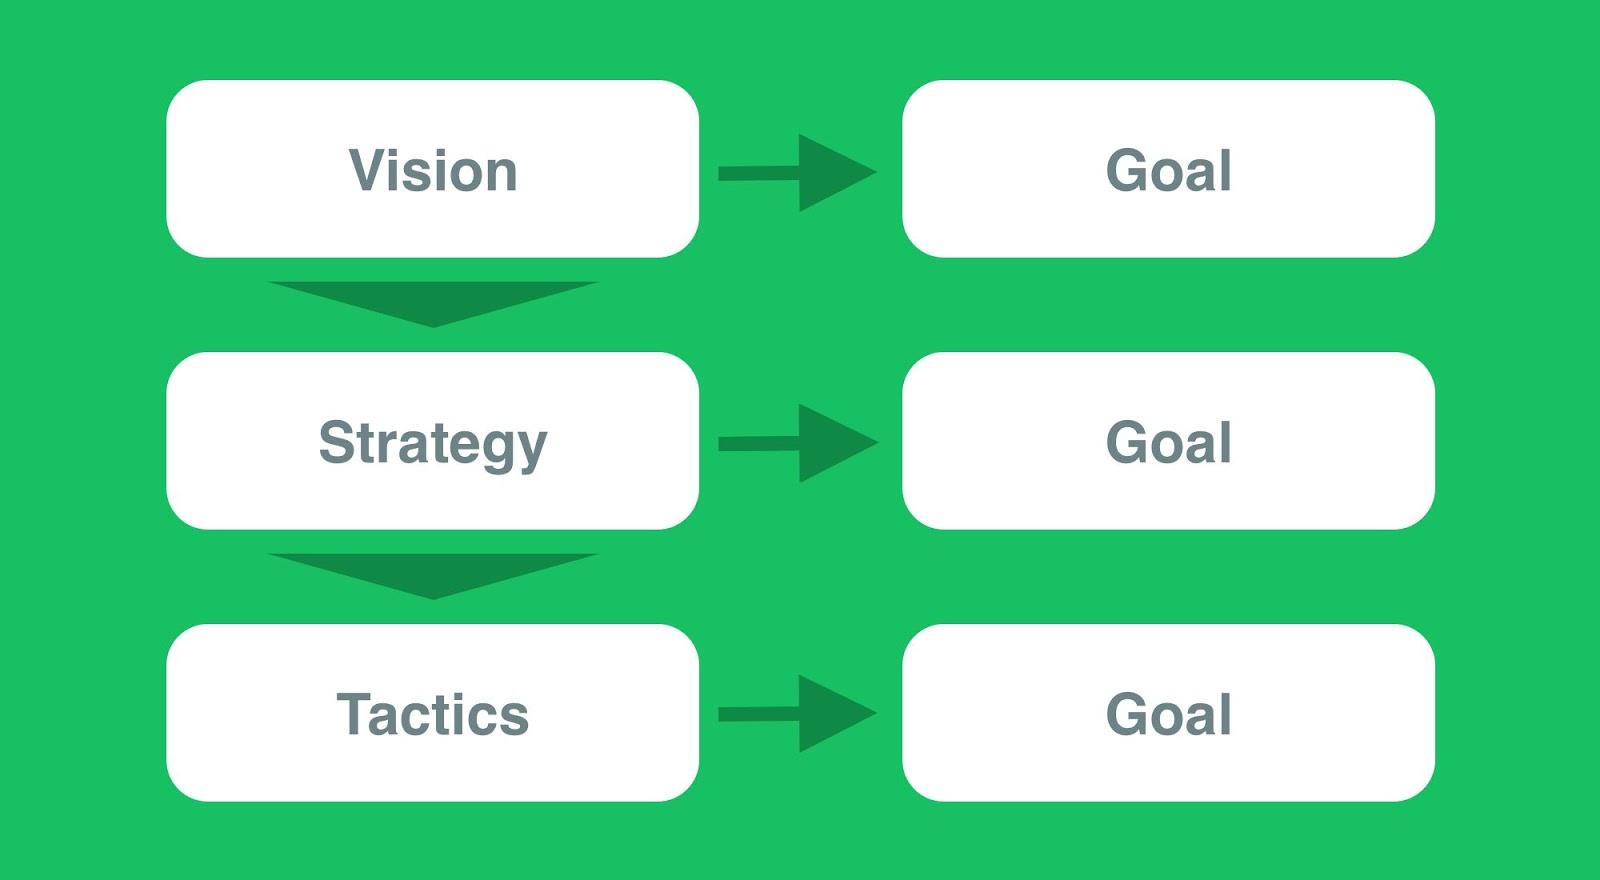 choosing-financial-ratios-for-goals